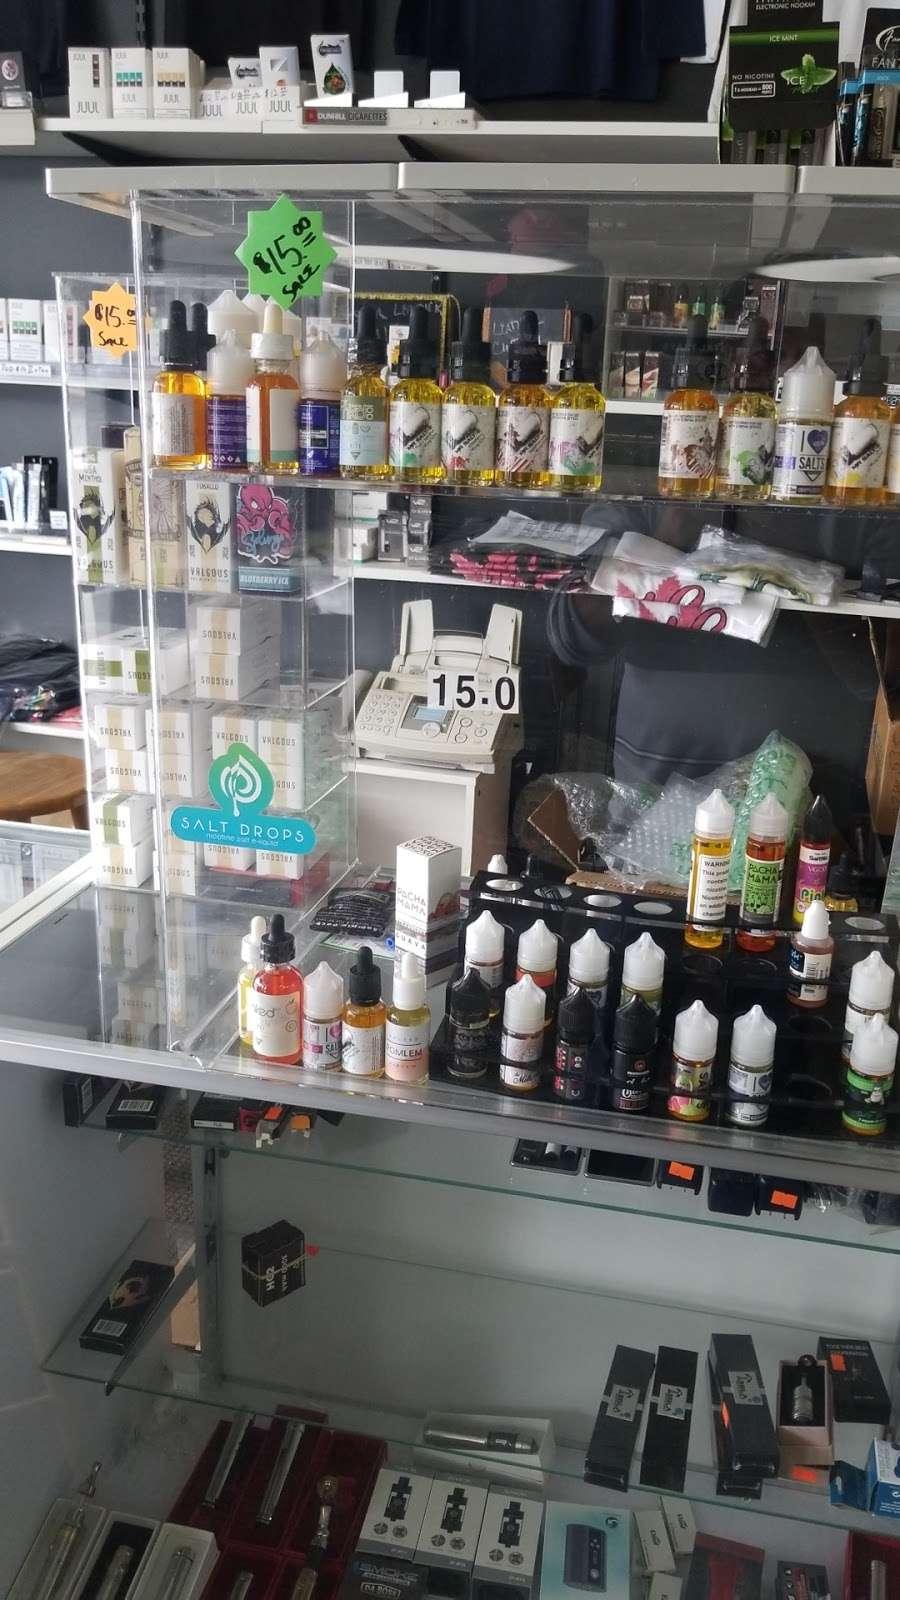 Butterfield Pantry - convenience store  | Photo 4 of 10 | Address: 22W535 Butterfield Rd # 7, Glen Ellyn, IL 60137, USA | Phone: (630) 858-3350